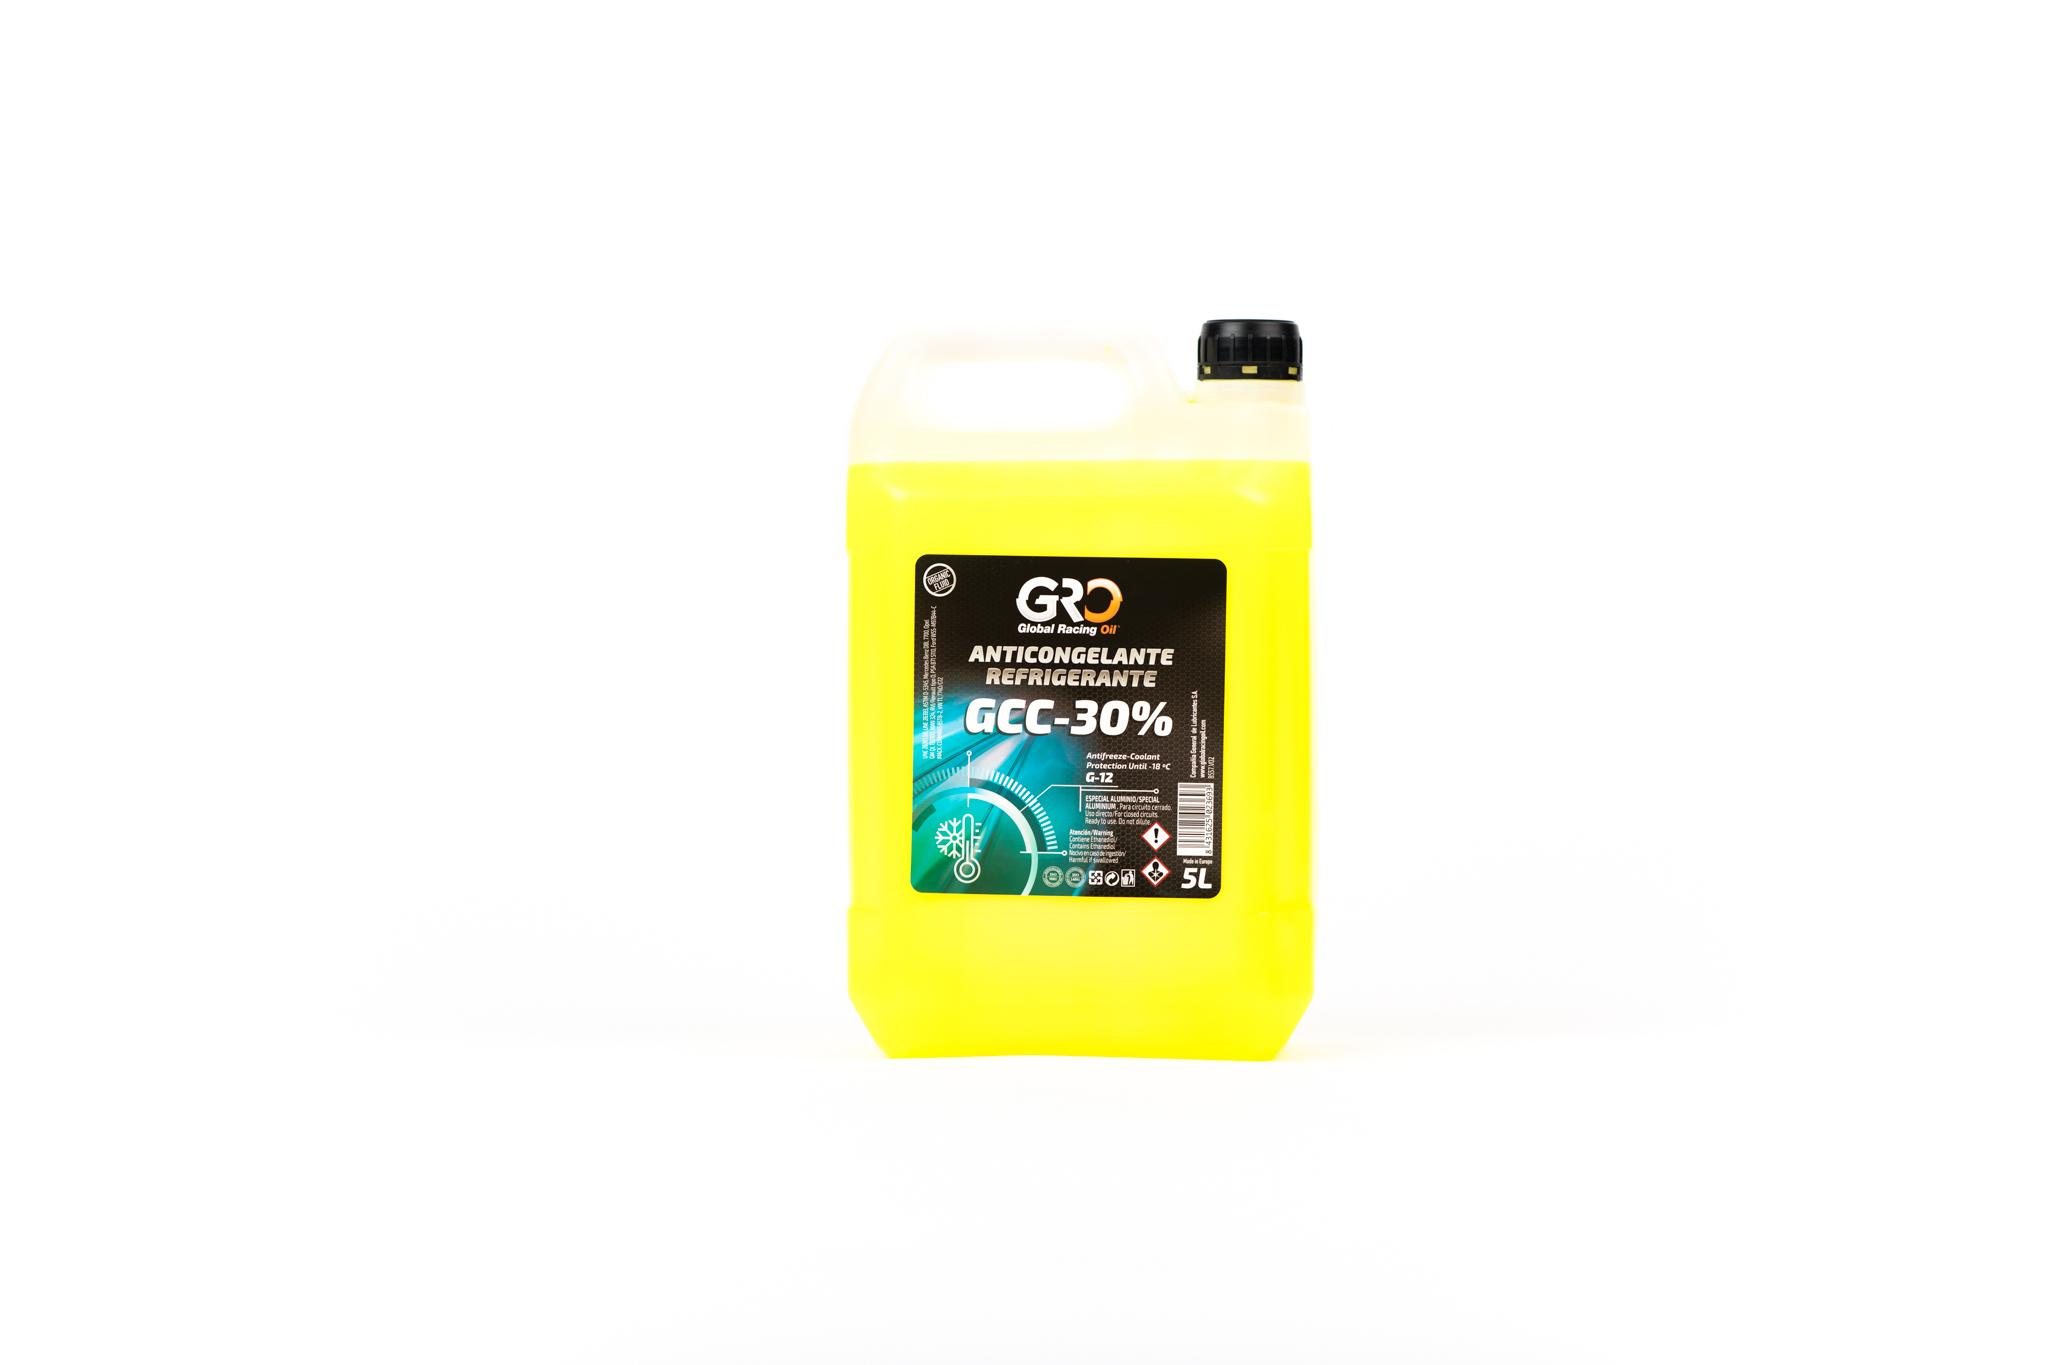 gro anticongelante-refrigerante gcc-30� amarillo 5l